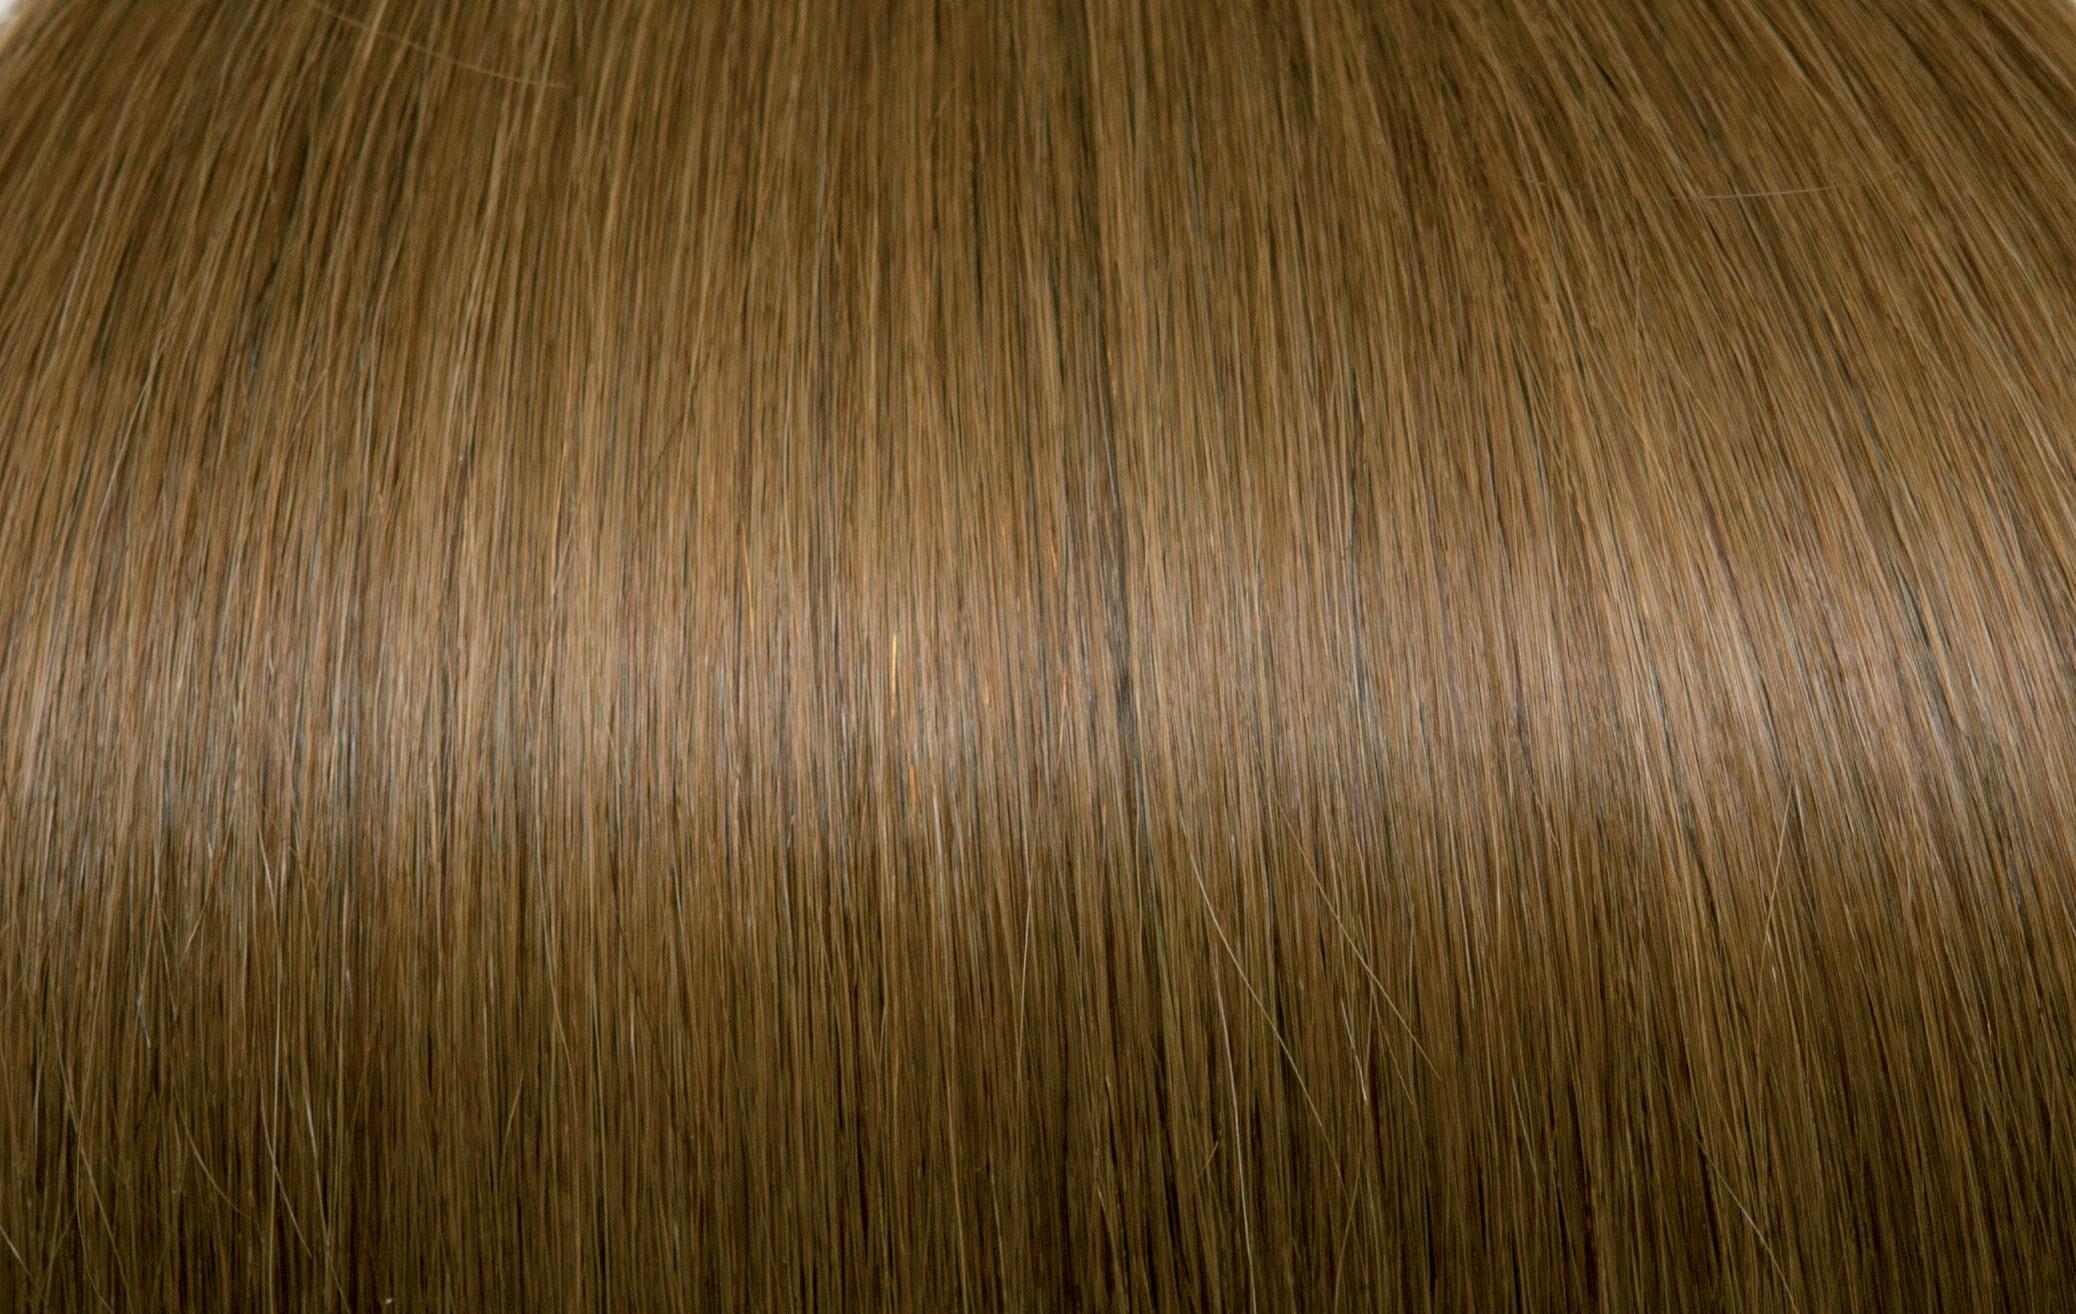 14. Light Golden Blond Copper